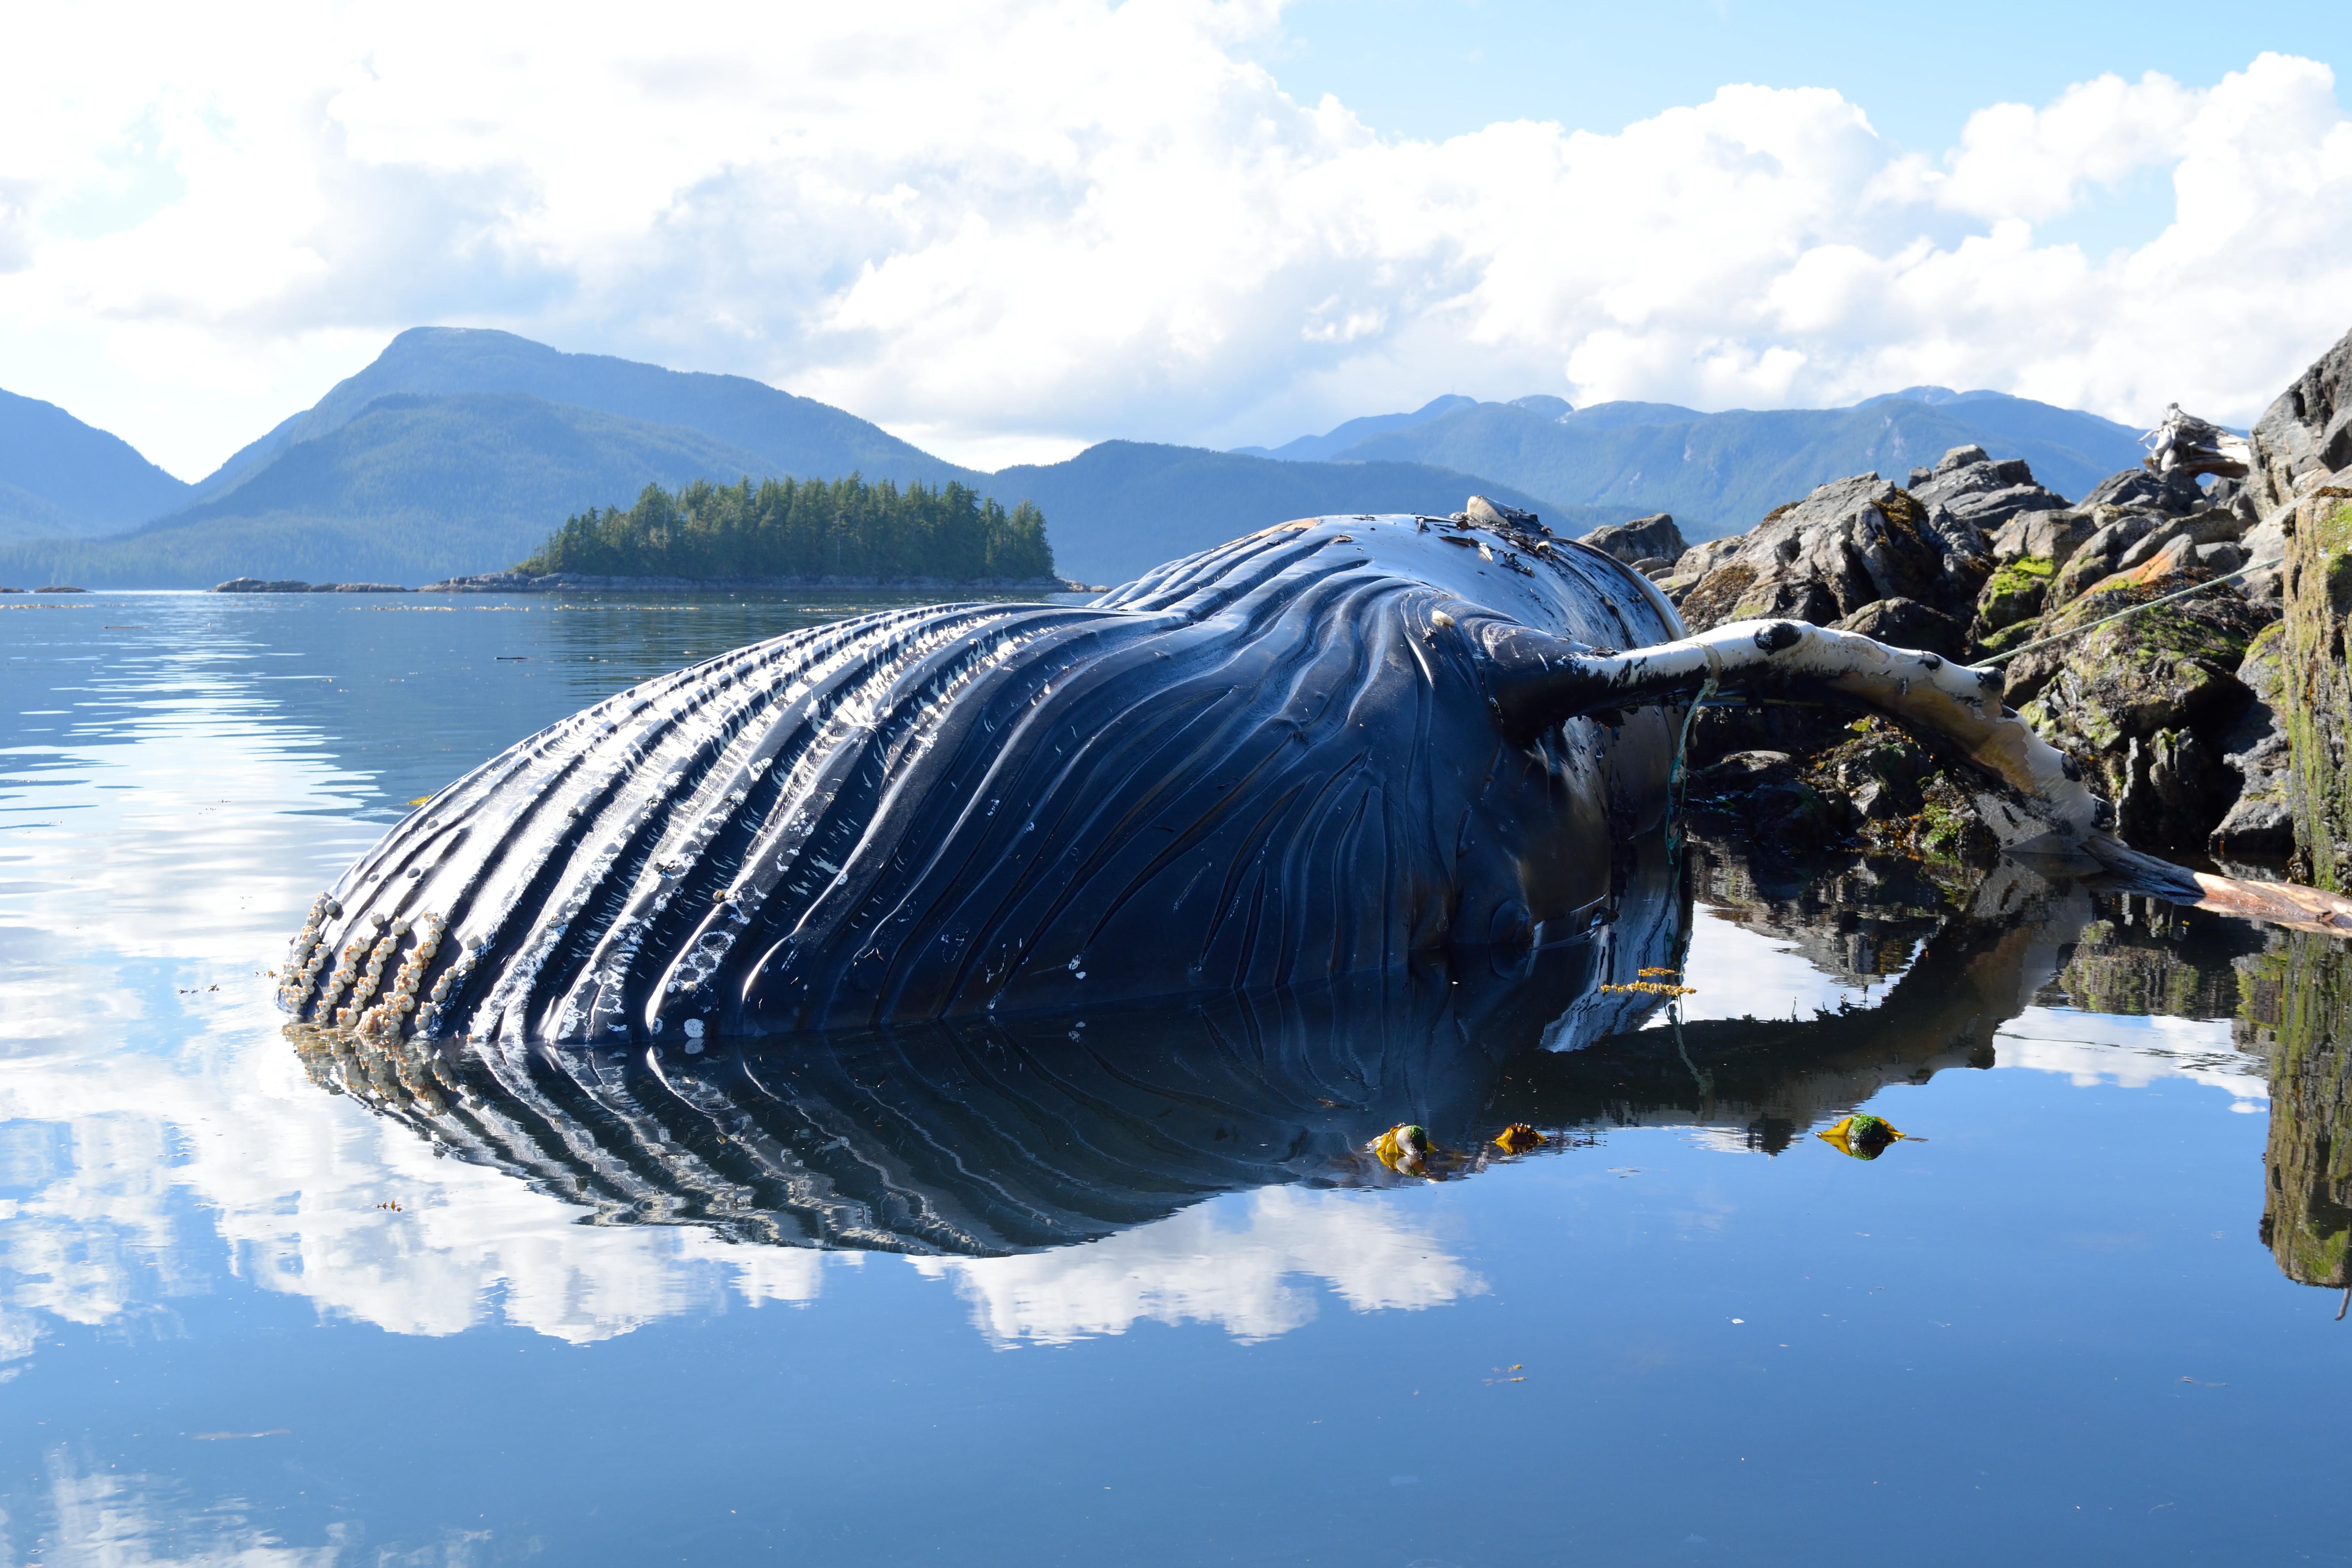 A dead humpback whale found this summer near Klemtu in British Columbia.